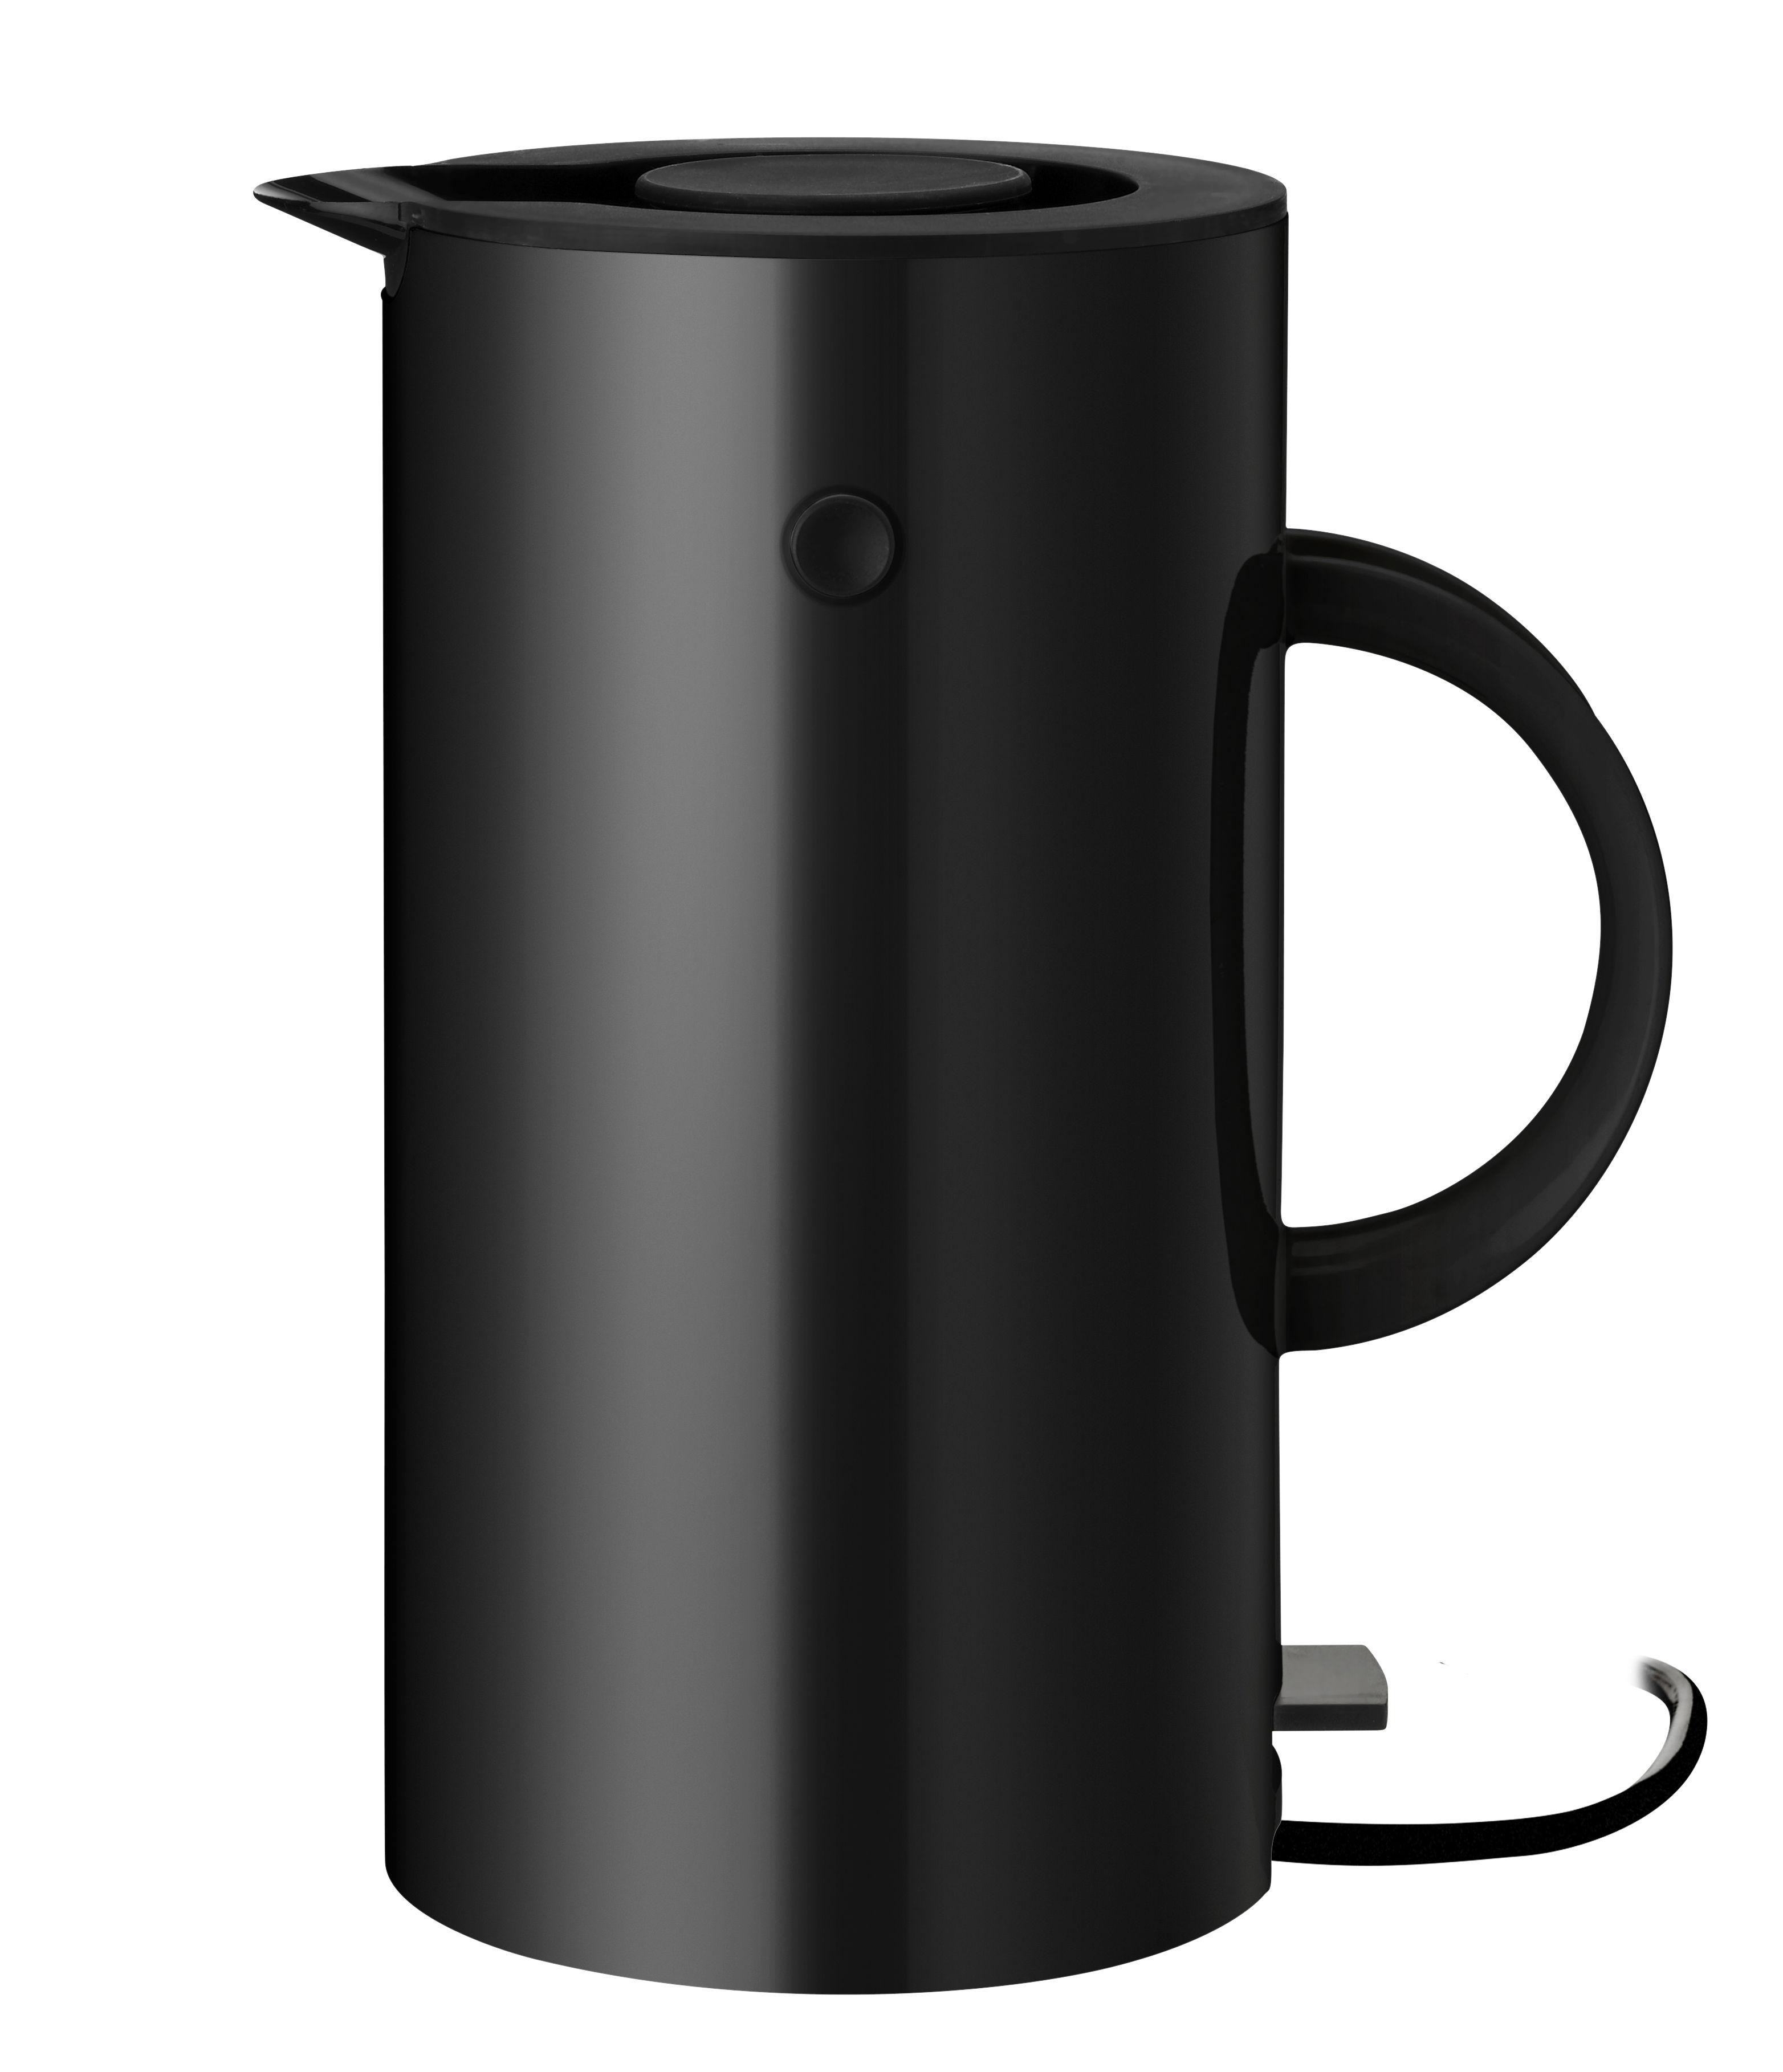 Kitchenware - Kettles & Teapots - EM77 Electric kettle - / 1.5 L by Stelton - Black - ABS plastic